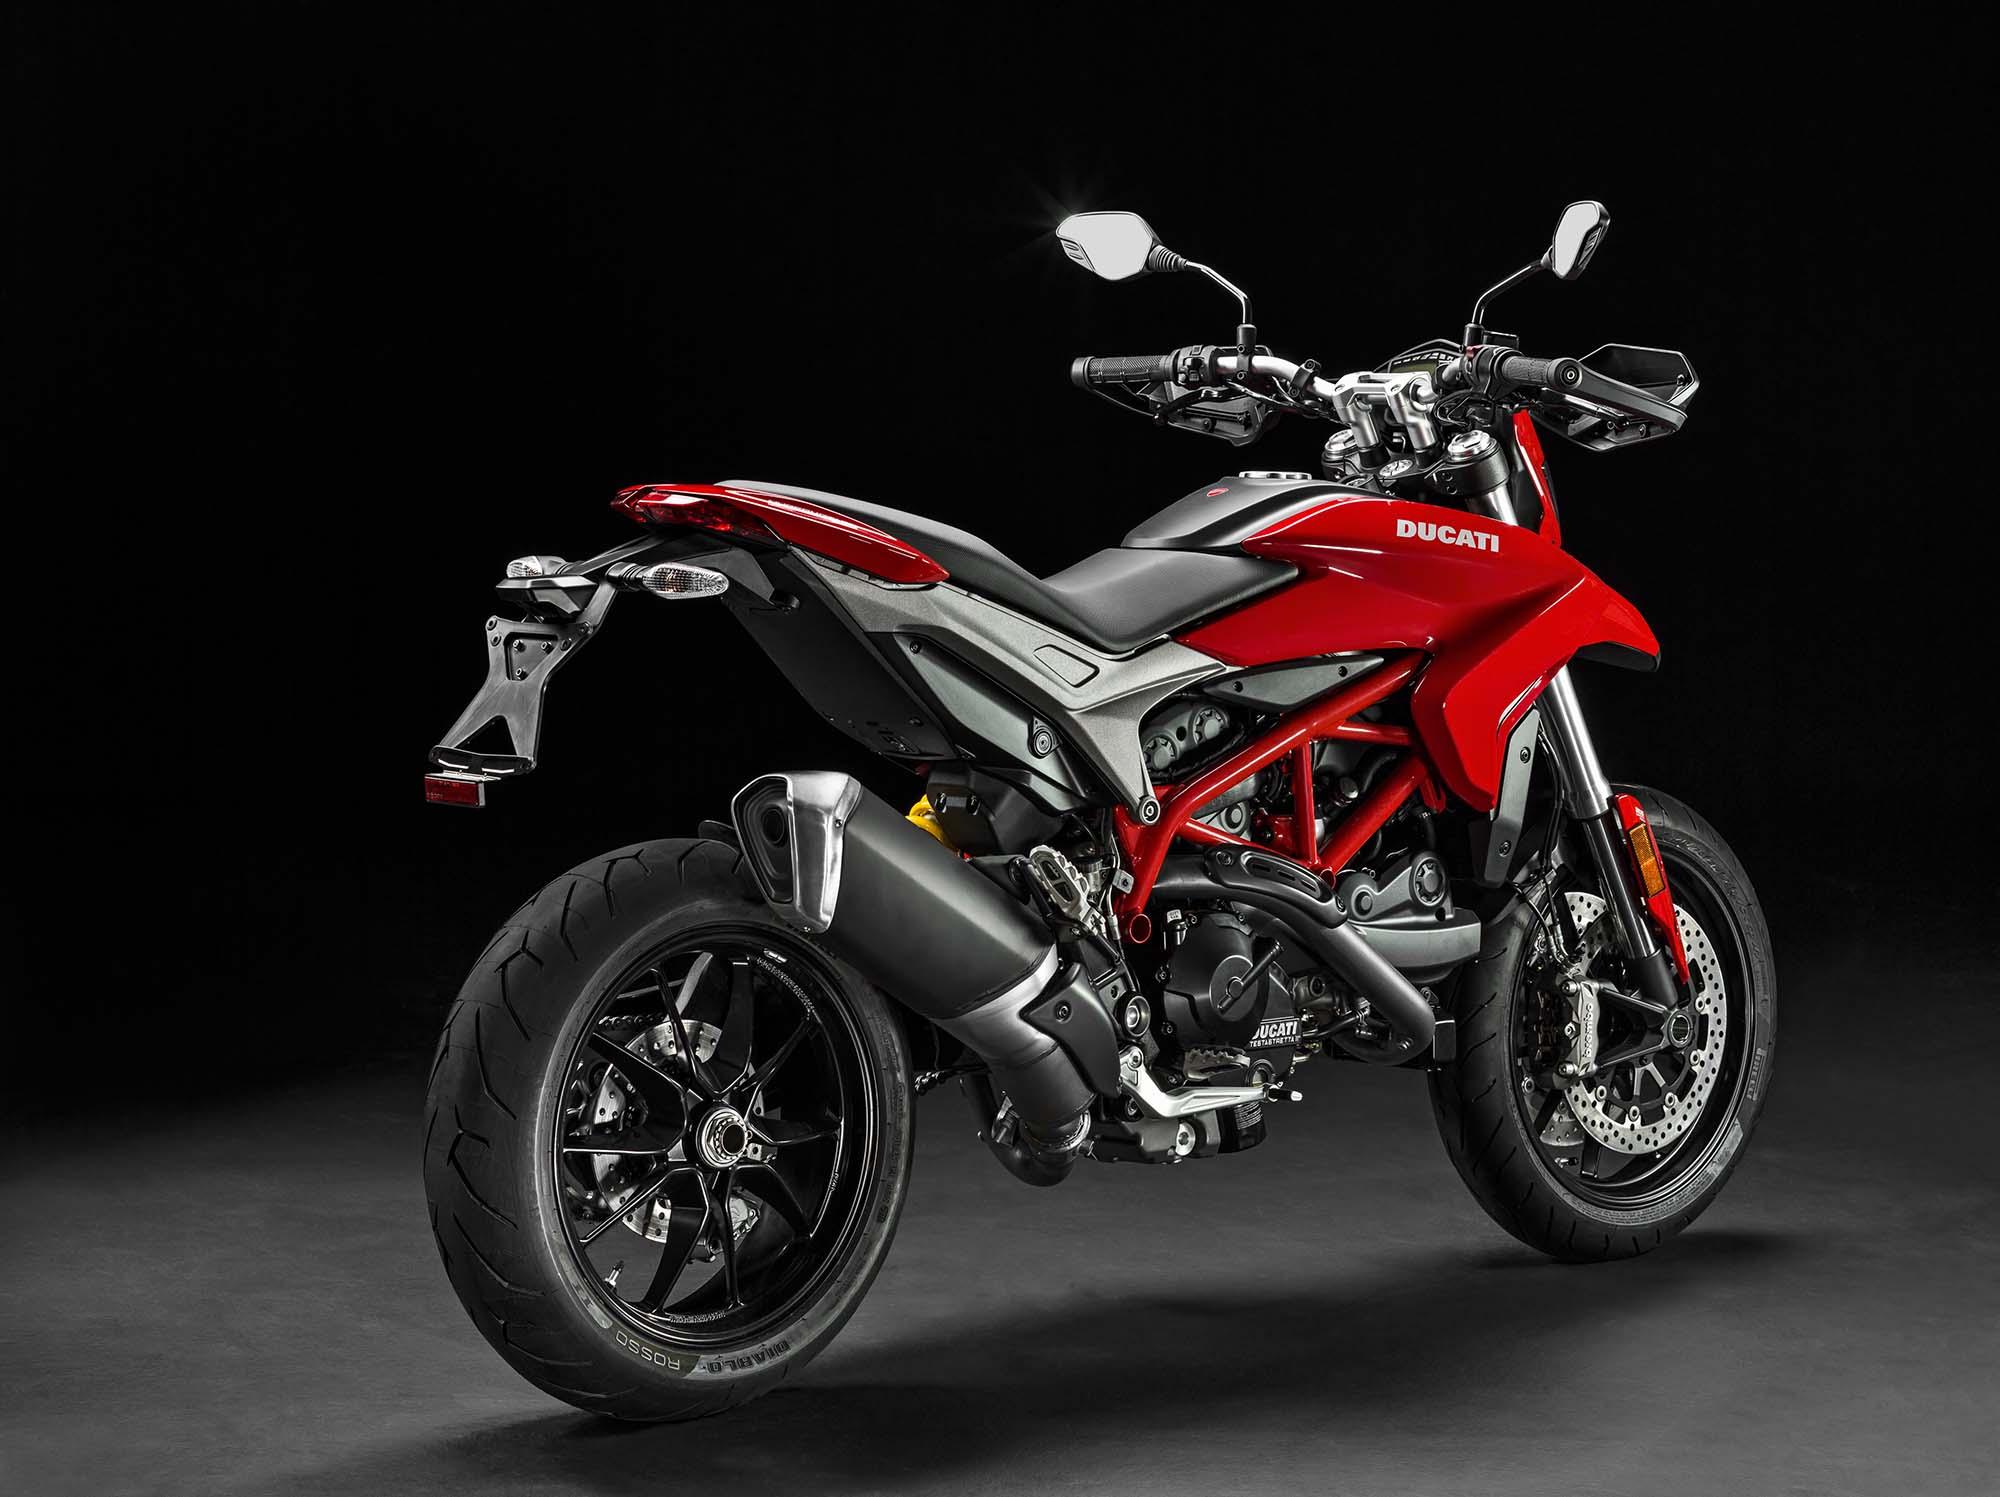 2016 Ducati Hypermotard 939 Family